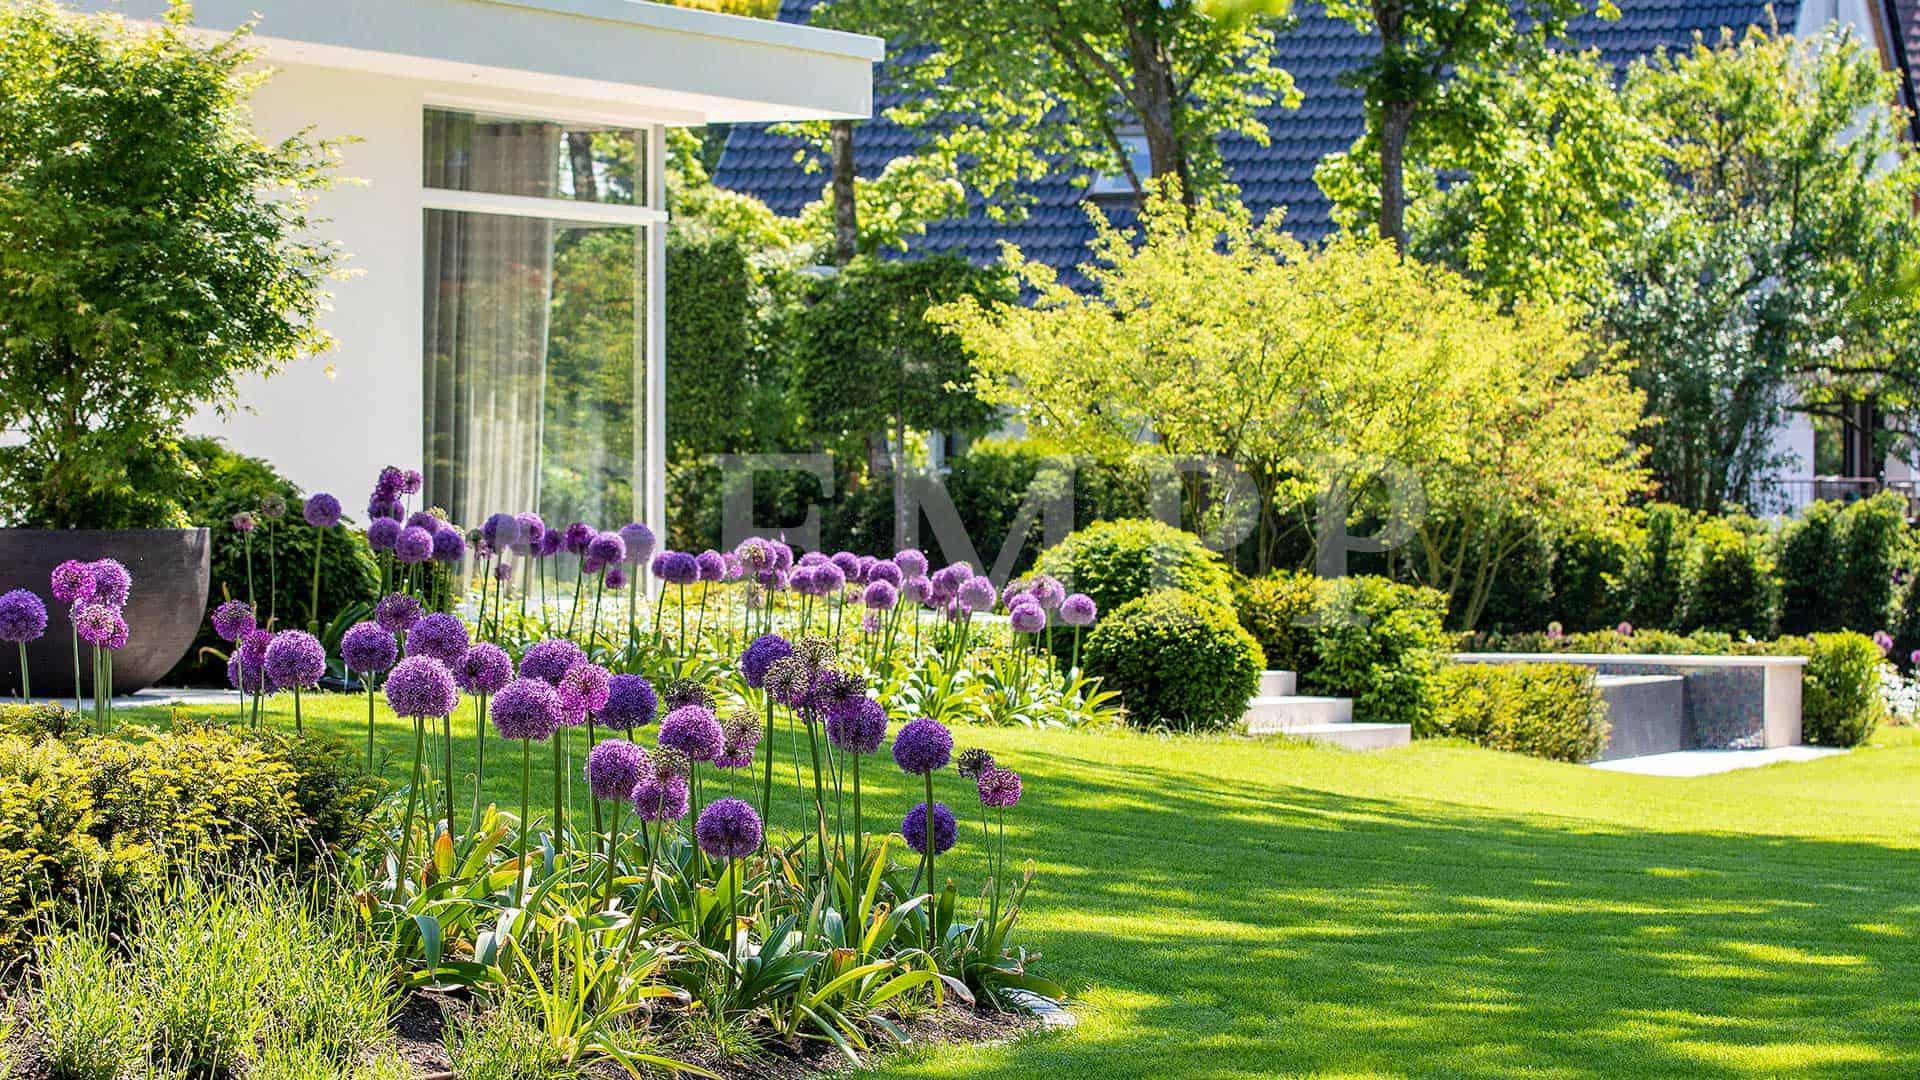 Jochen Gempp Gartenarchitekt Gartengestaltung